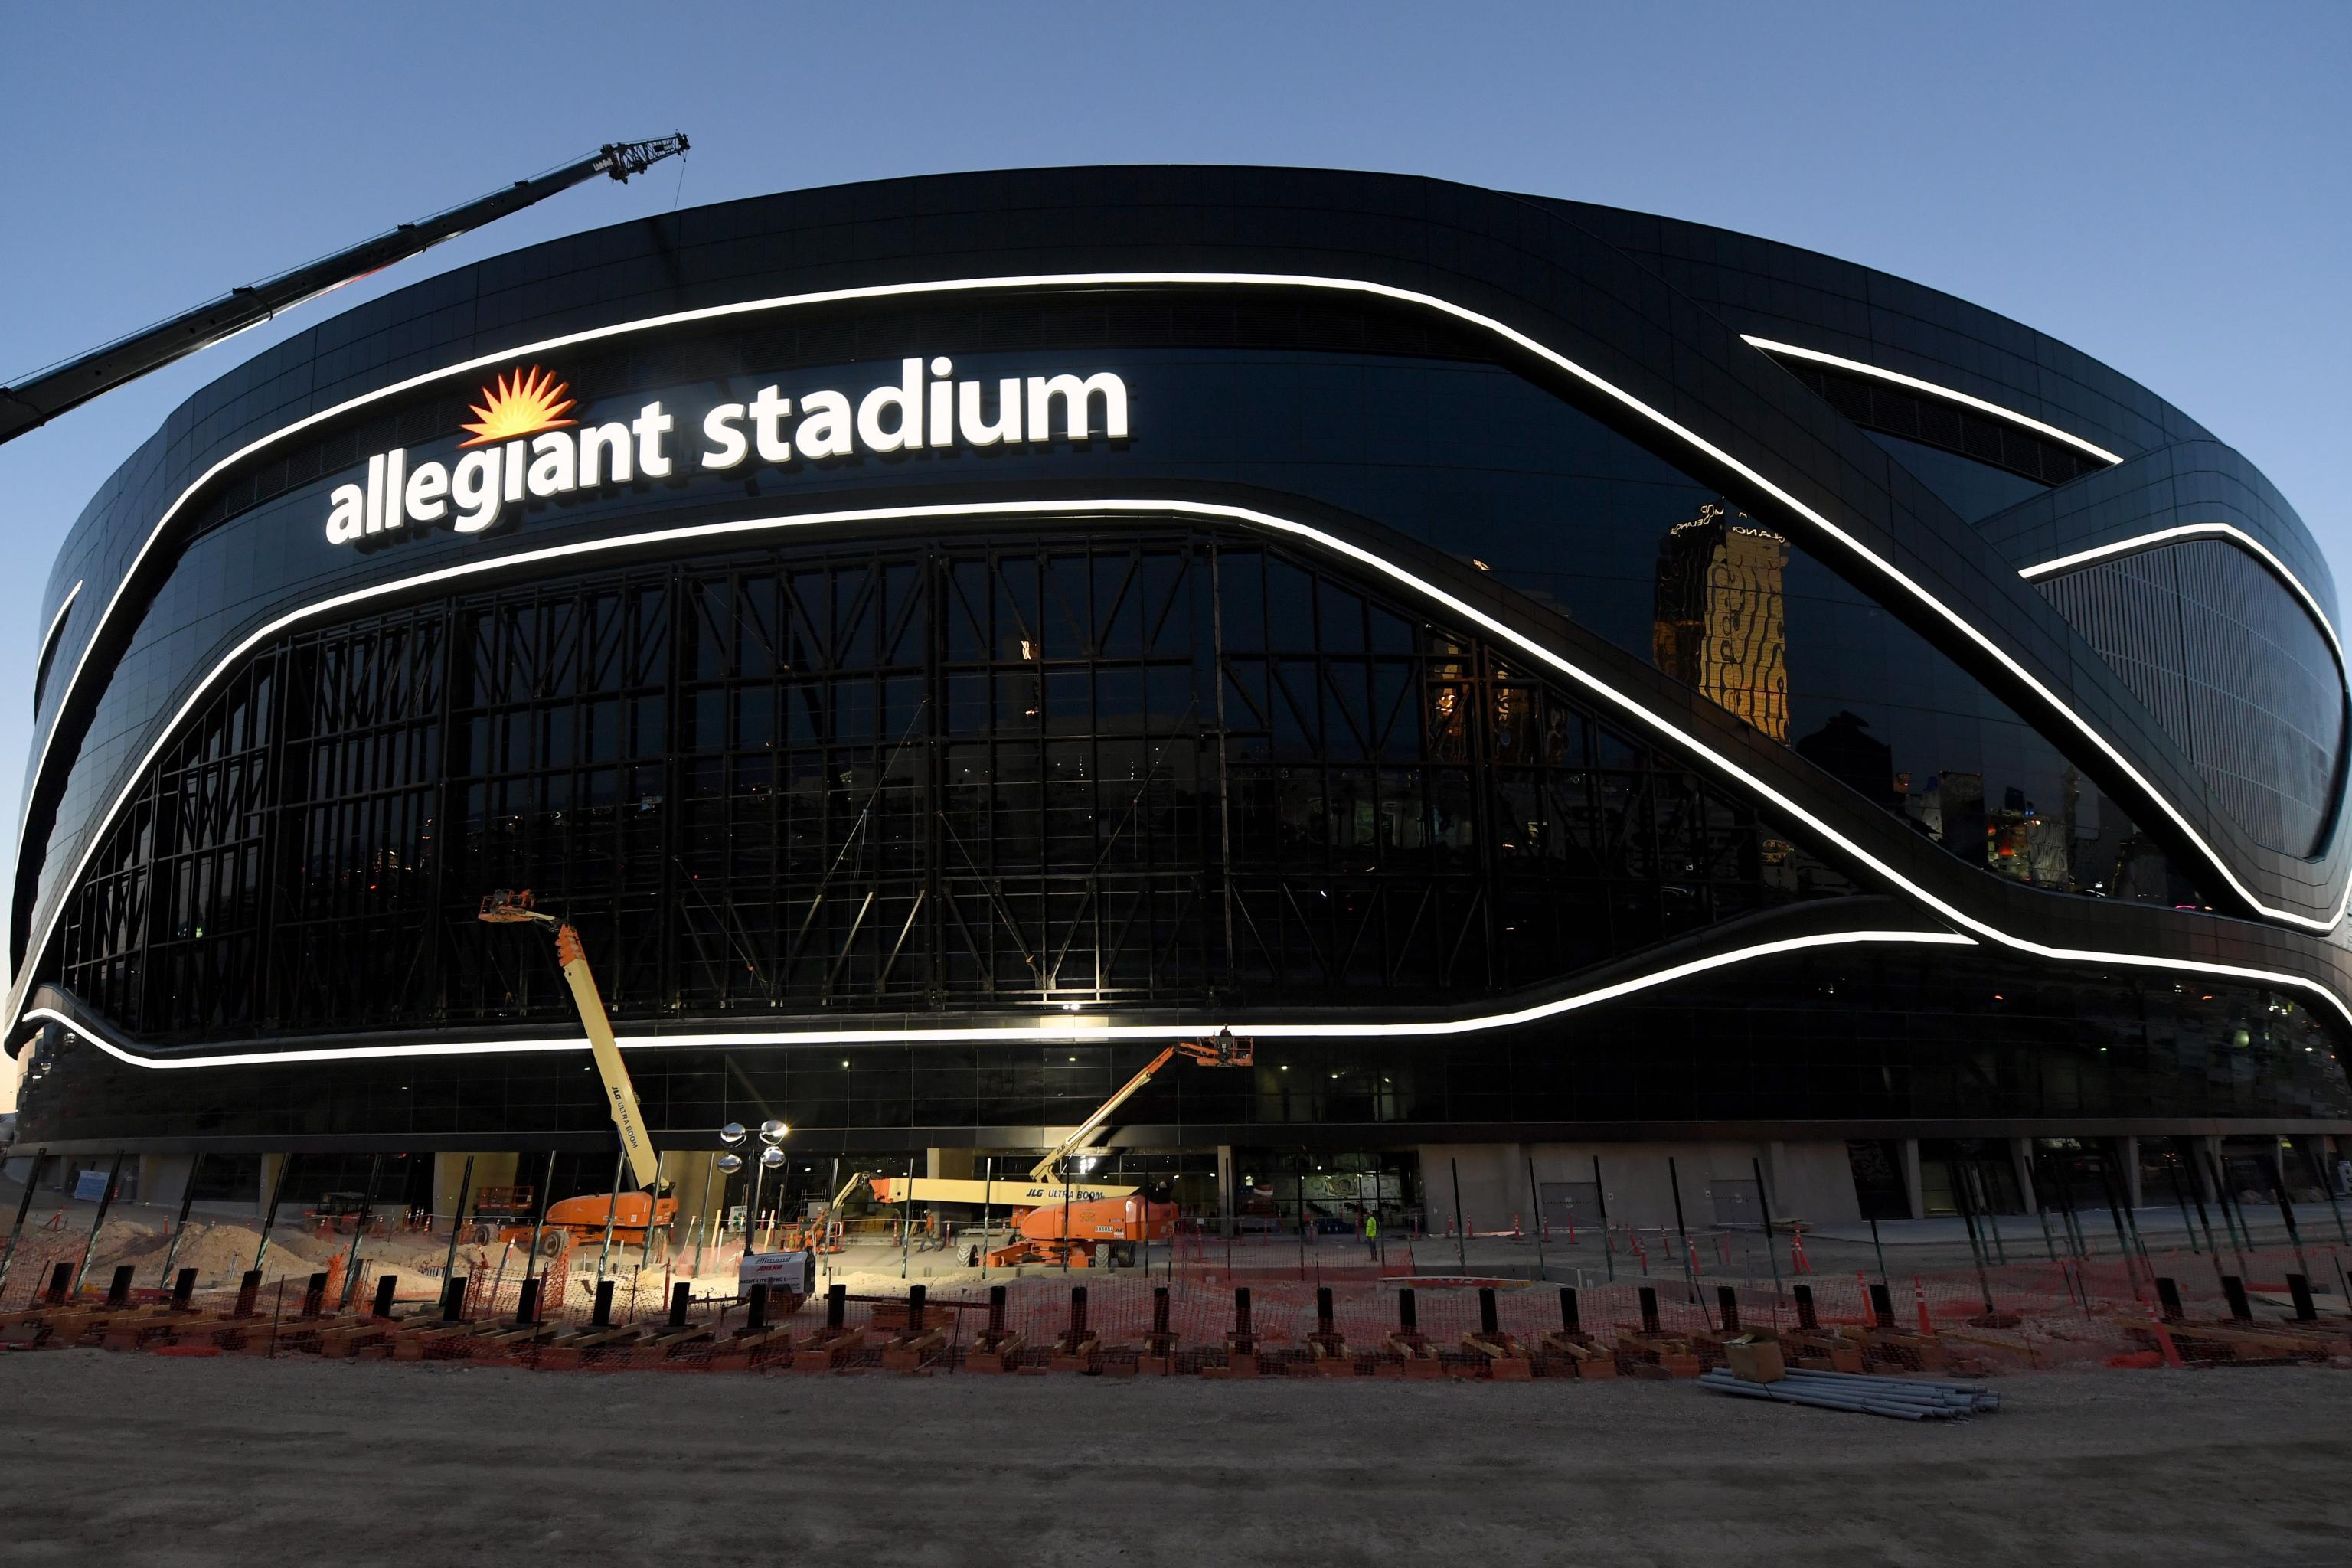 Las Vegas Raiders Allegiant Stadium To Host 2021 Nfl Pro Bowl Bleacher Report Latest News Videos And Highlights